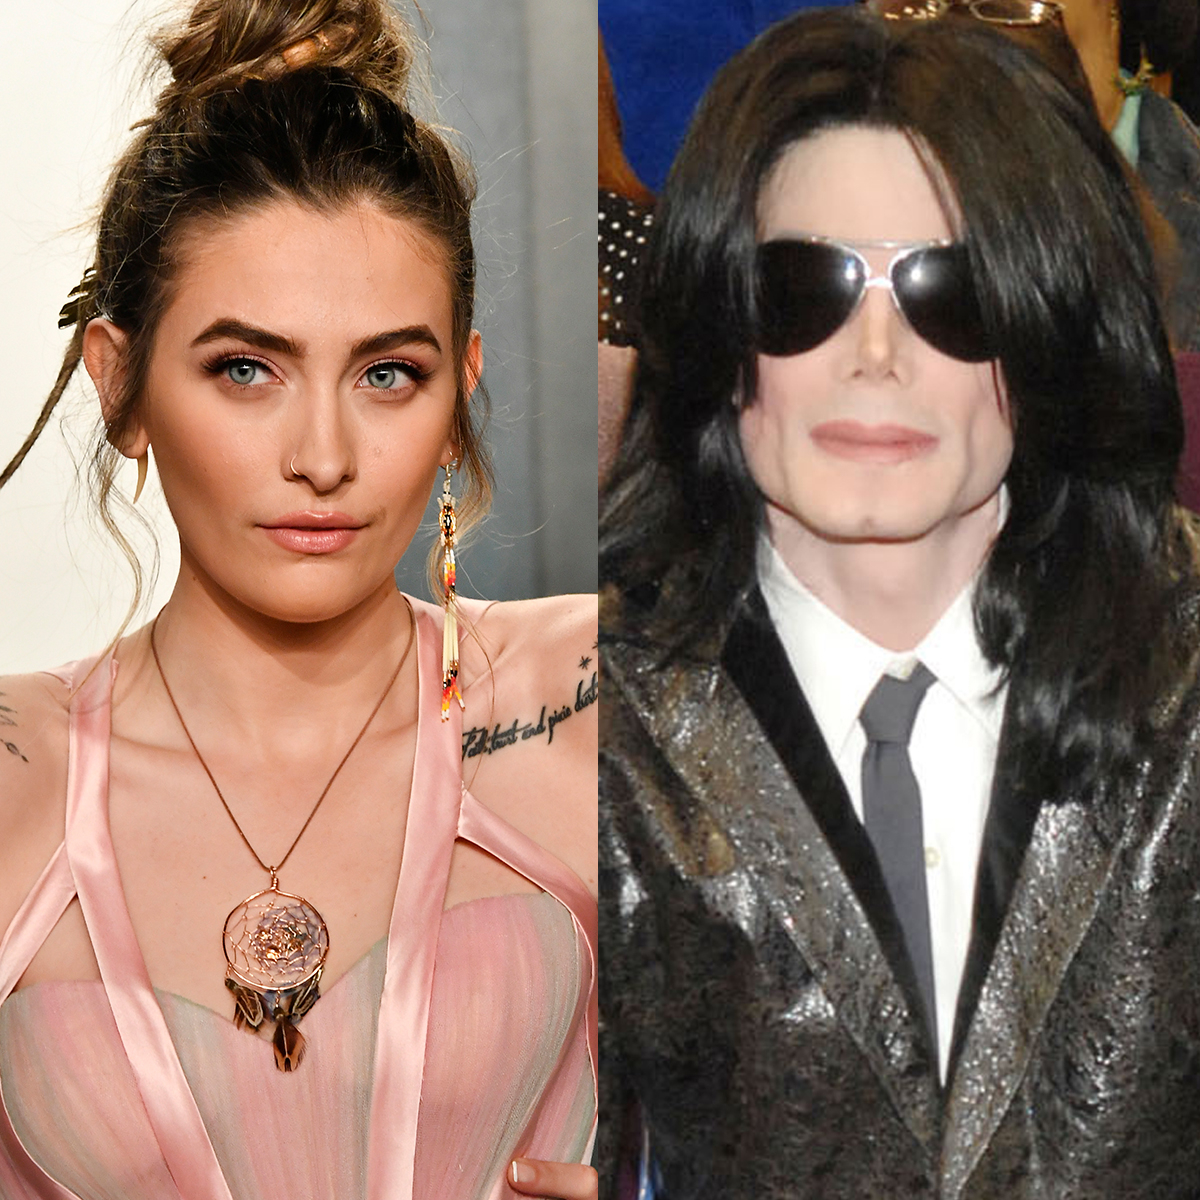 Paris Jackson Shares Rare Insight on Life With Dad Michael Jackson